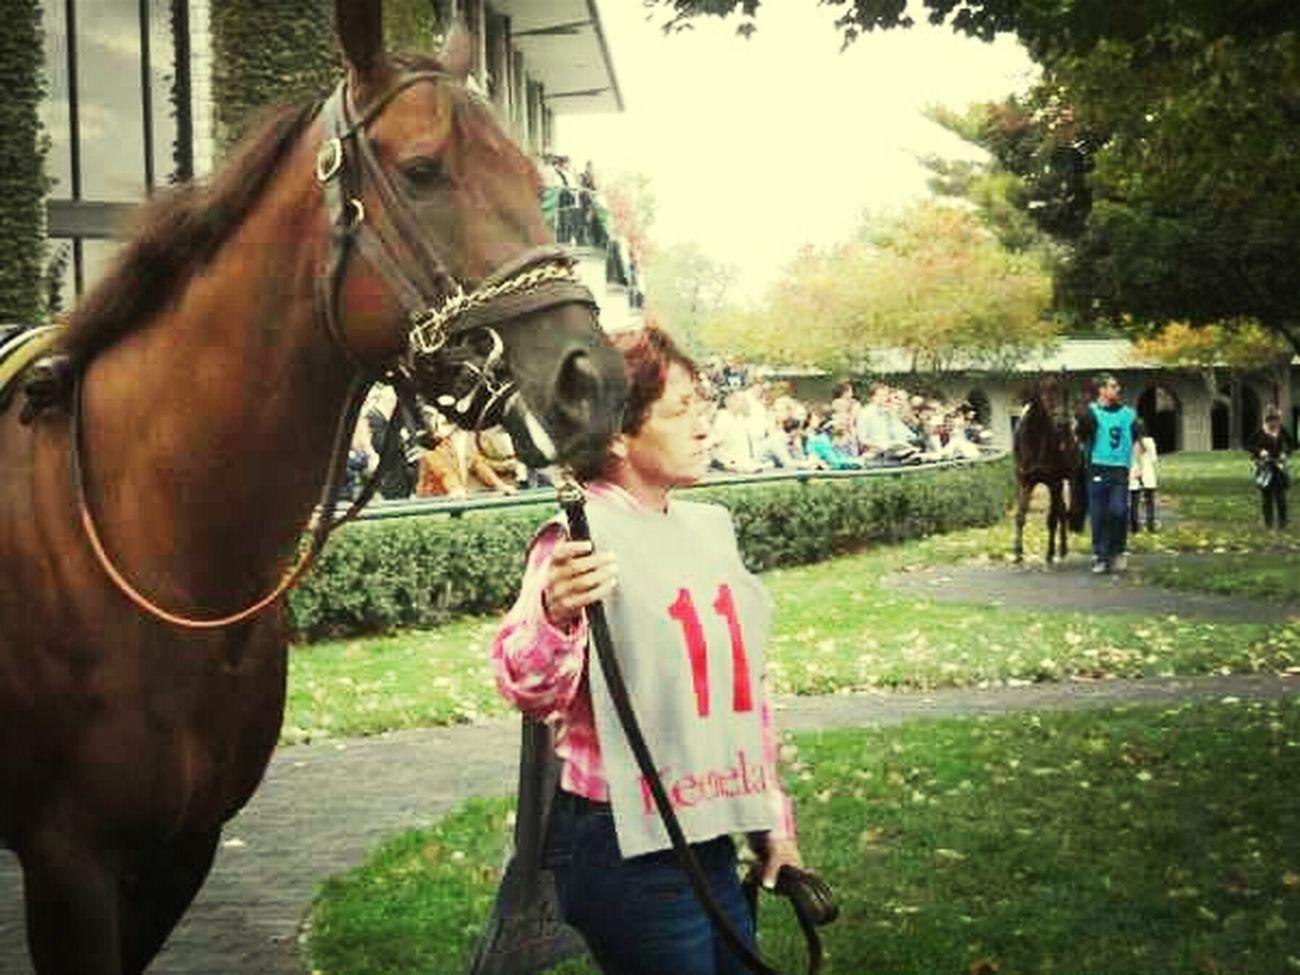 Fall Horses Racetrack Fall Meet Keeneland